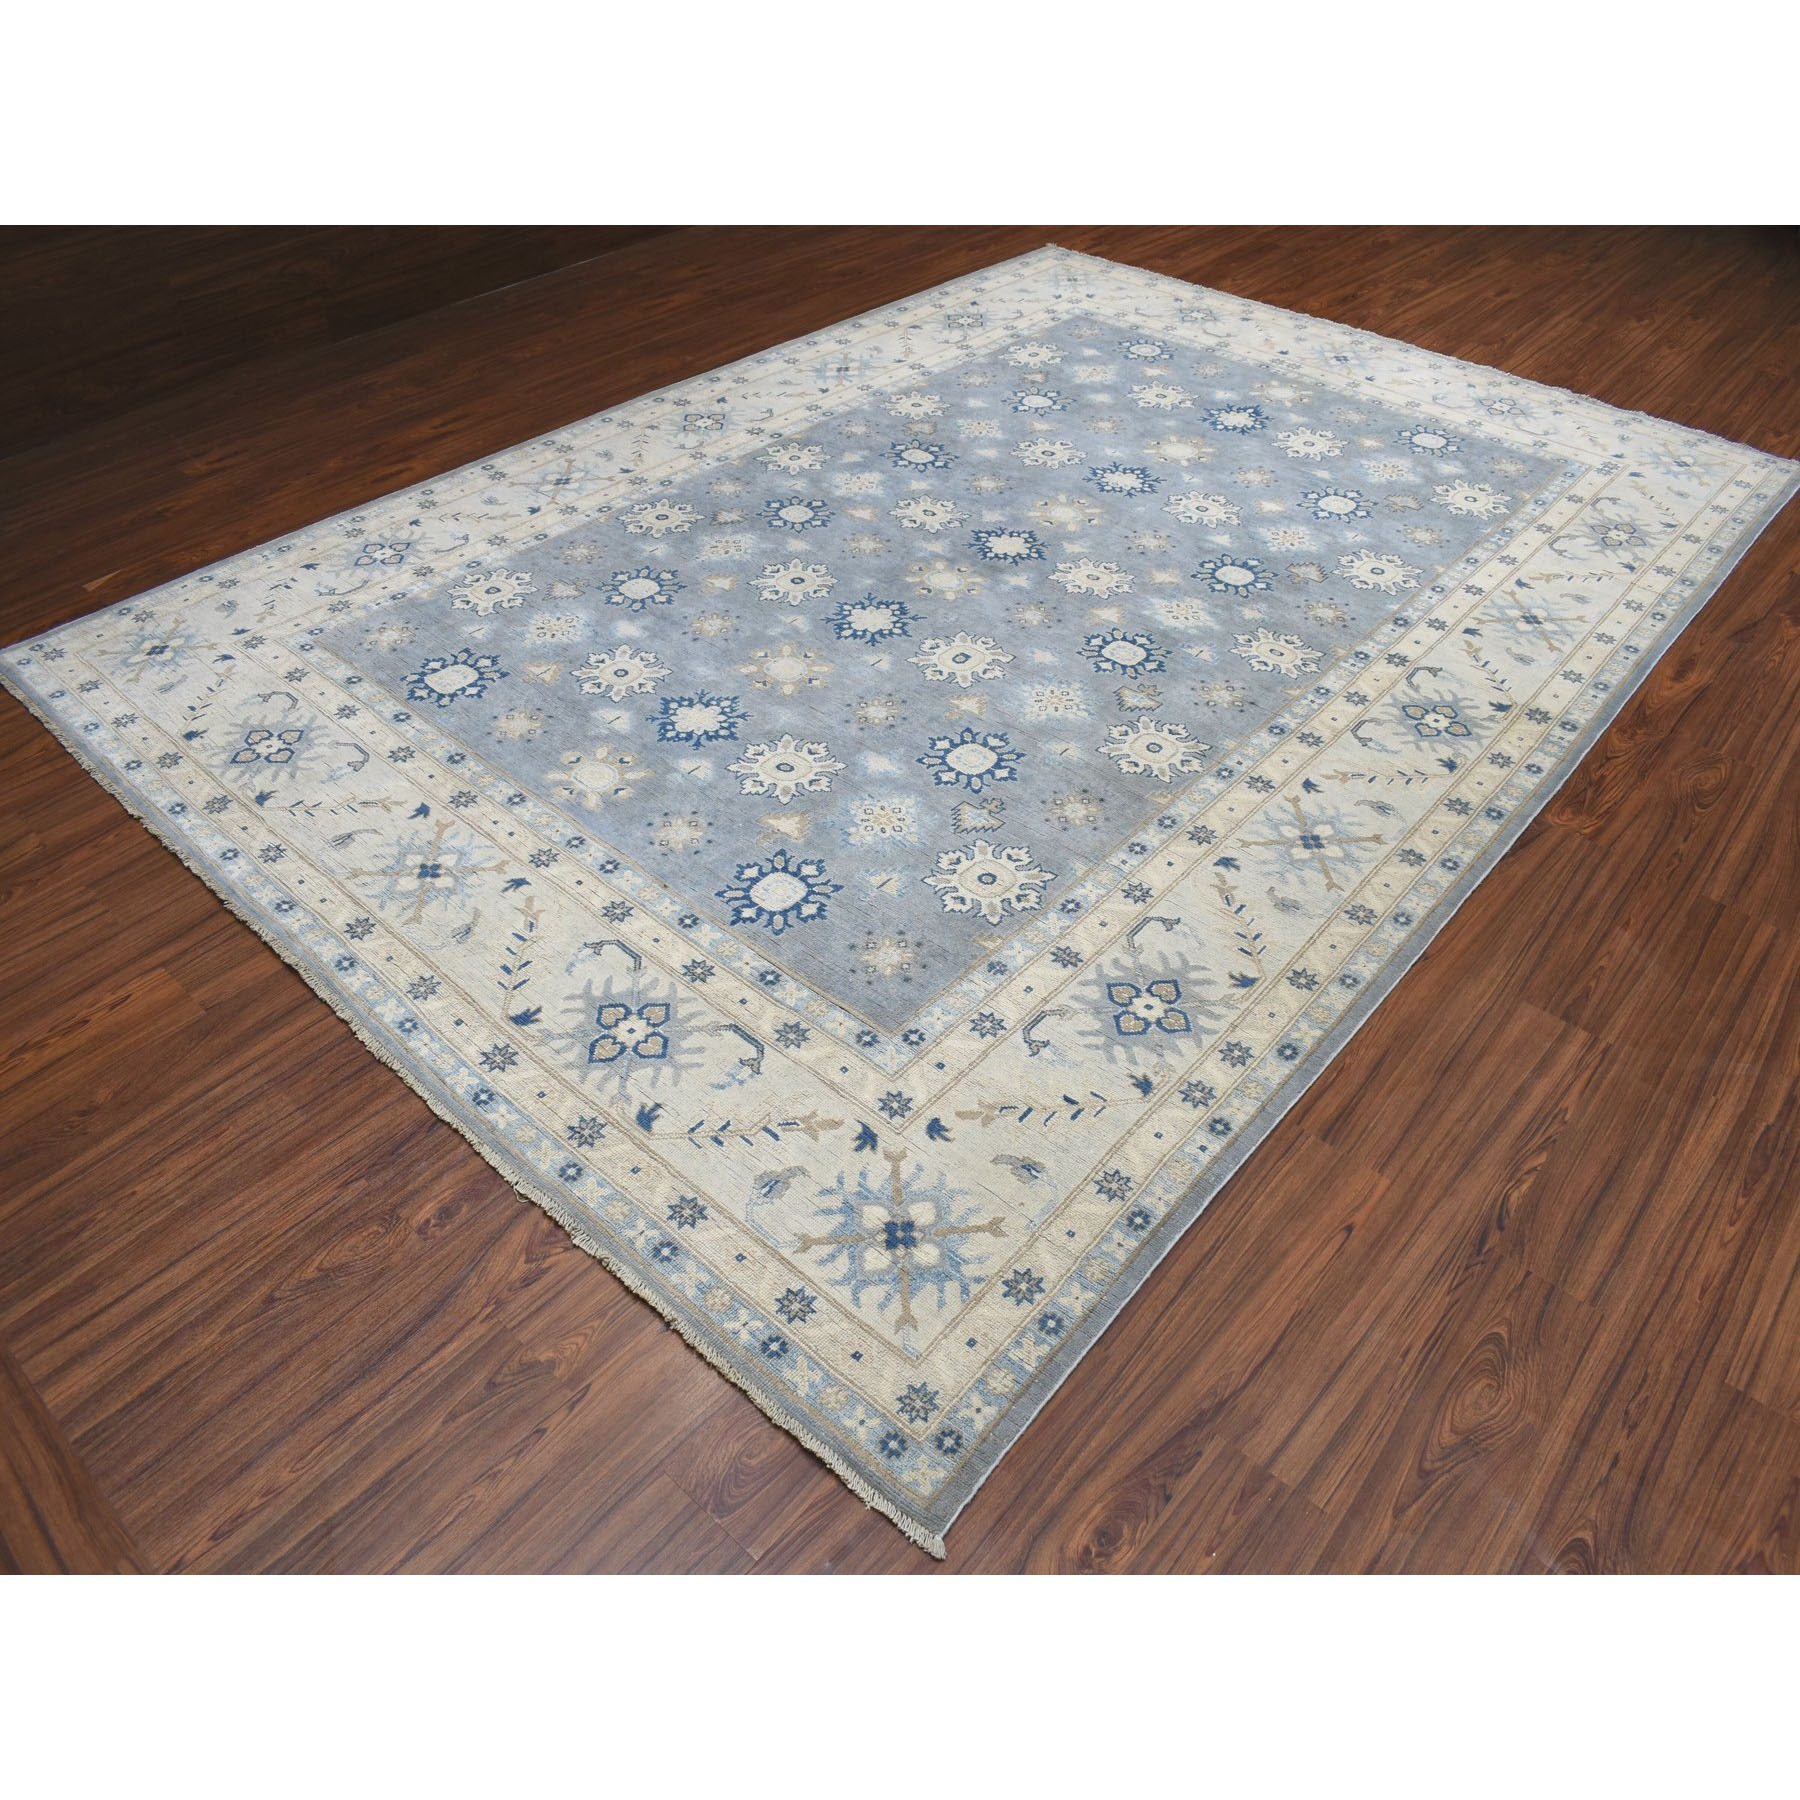 8-10 x12-3  Gray Vintage Look Kazak Geometric Design Pure Wool Hand Knotted Oriental Rug